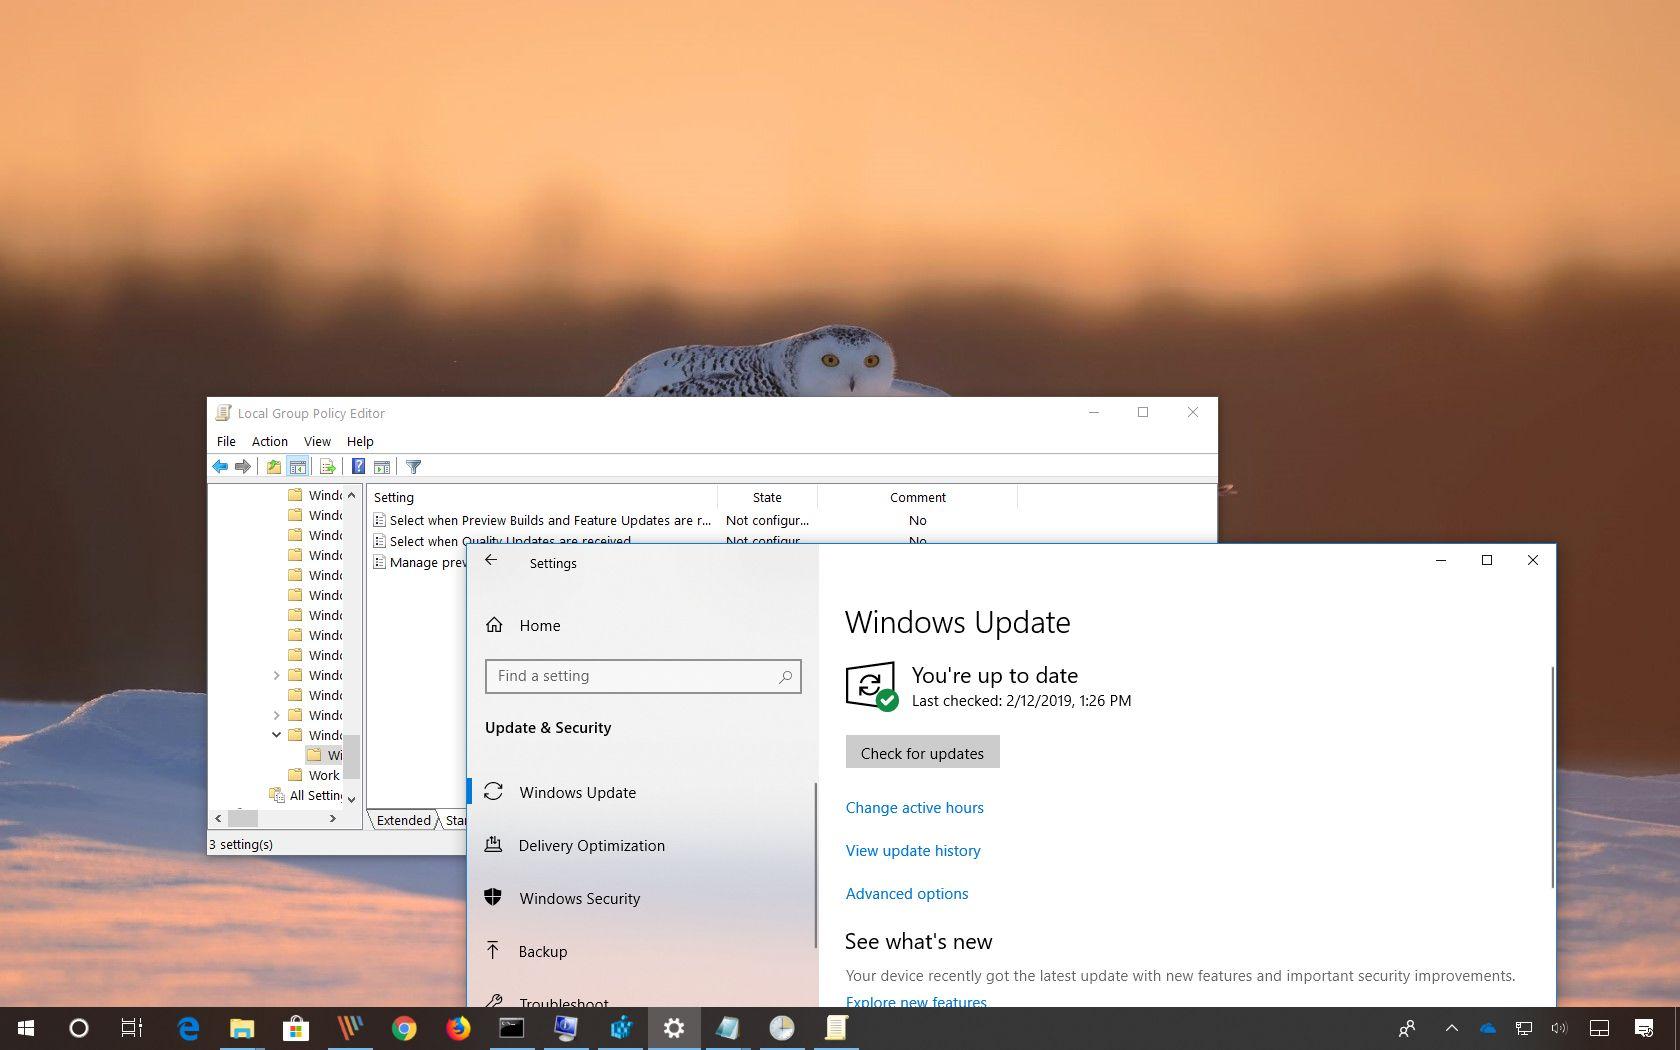 Options to defer Windows 10 version 1903, April 2019 Update